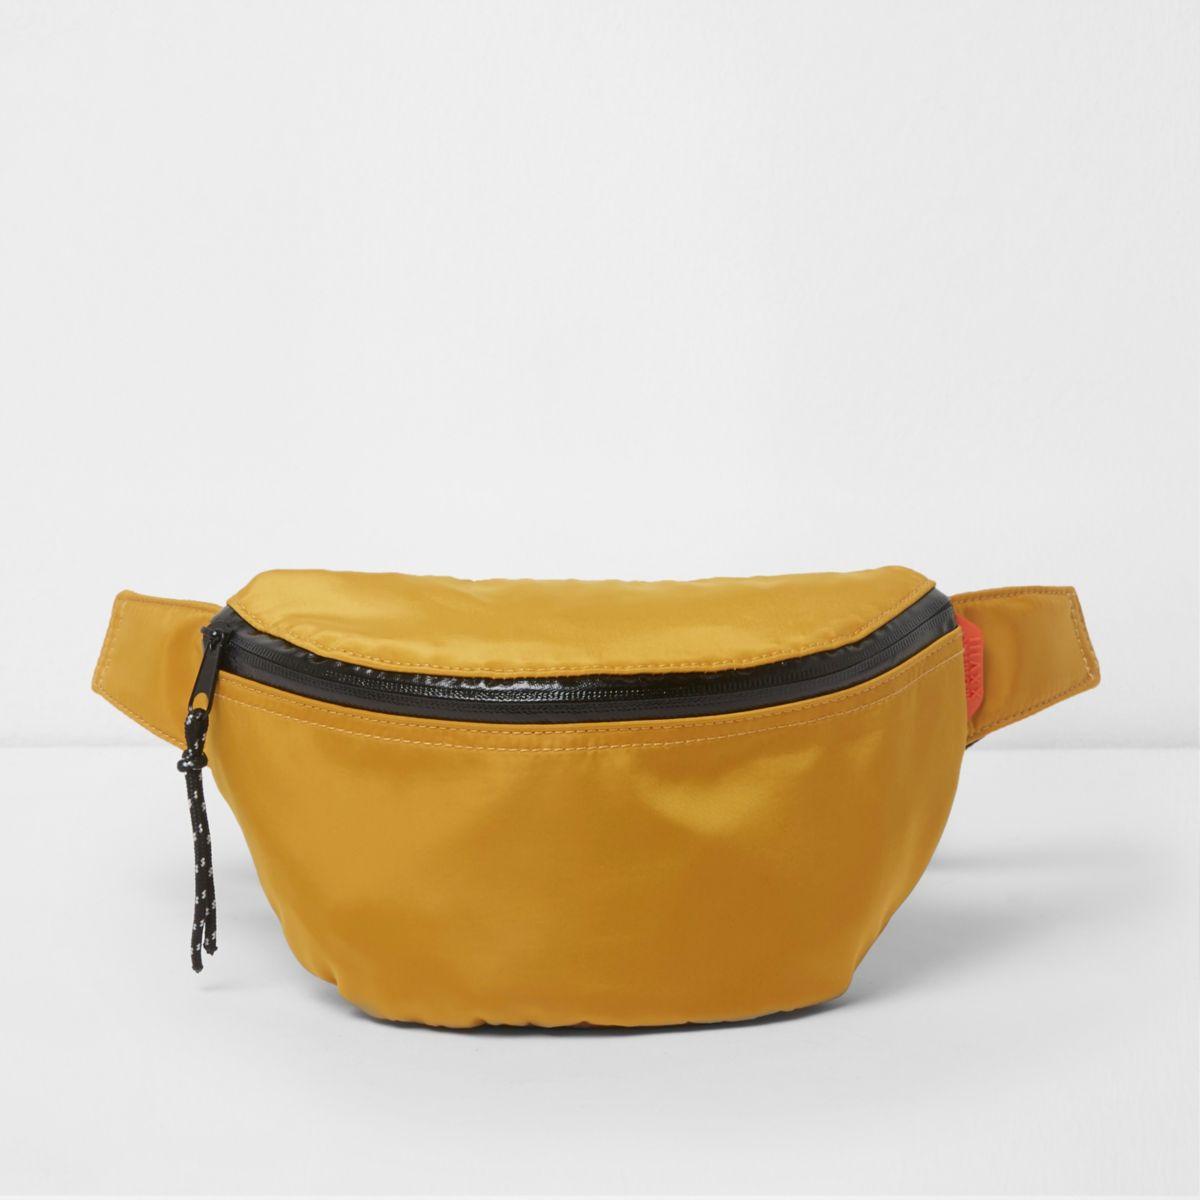 Mustard yellow sports bumbag